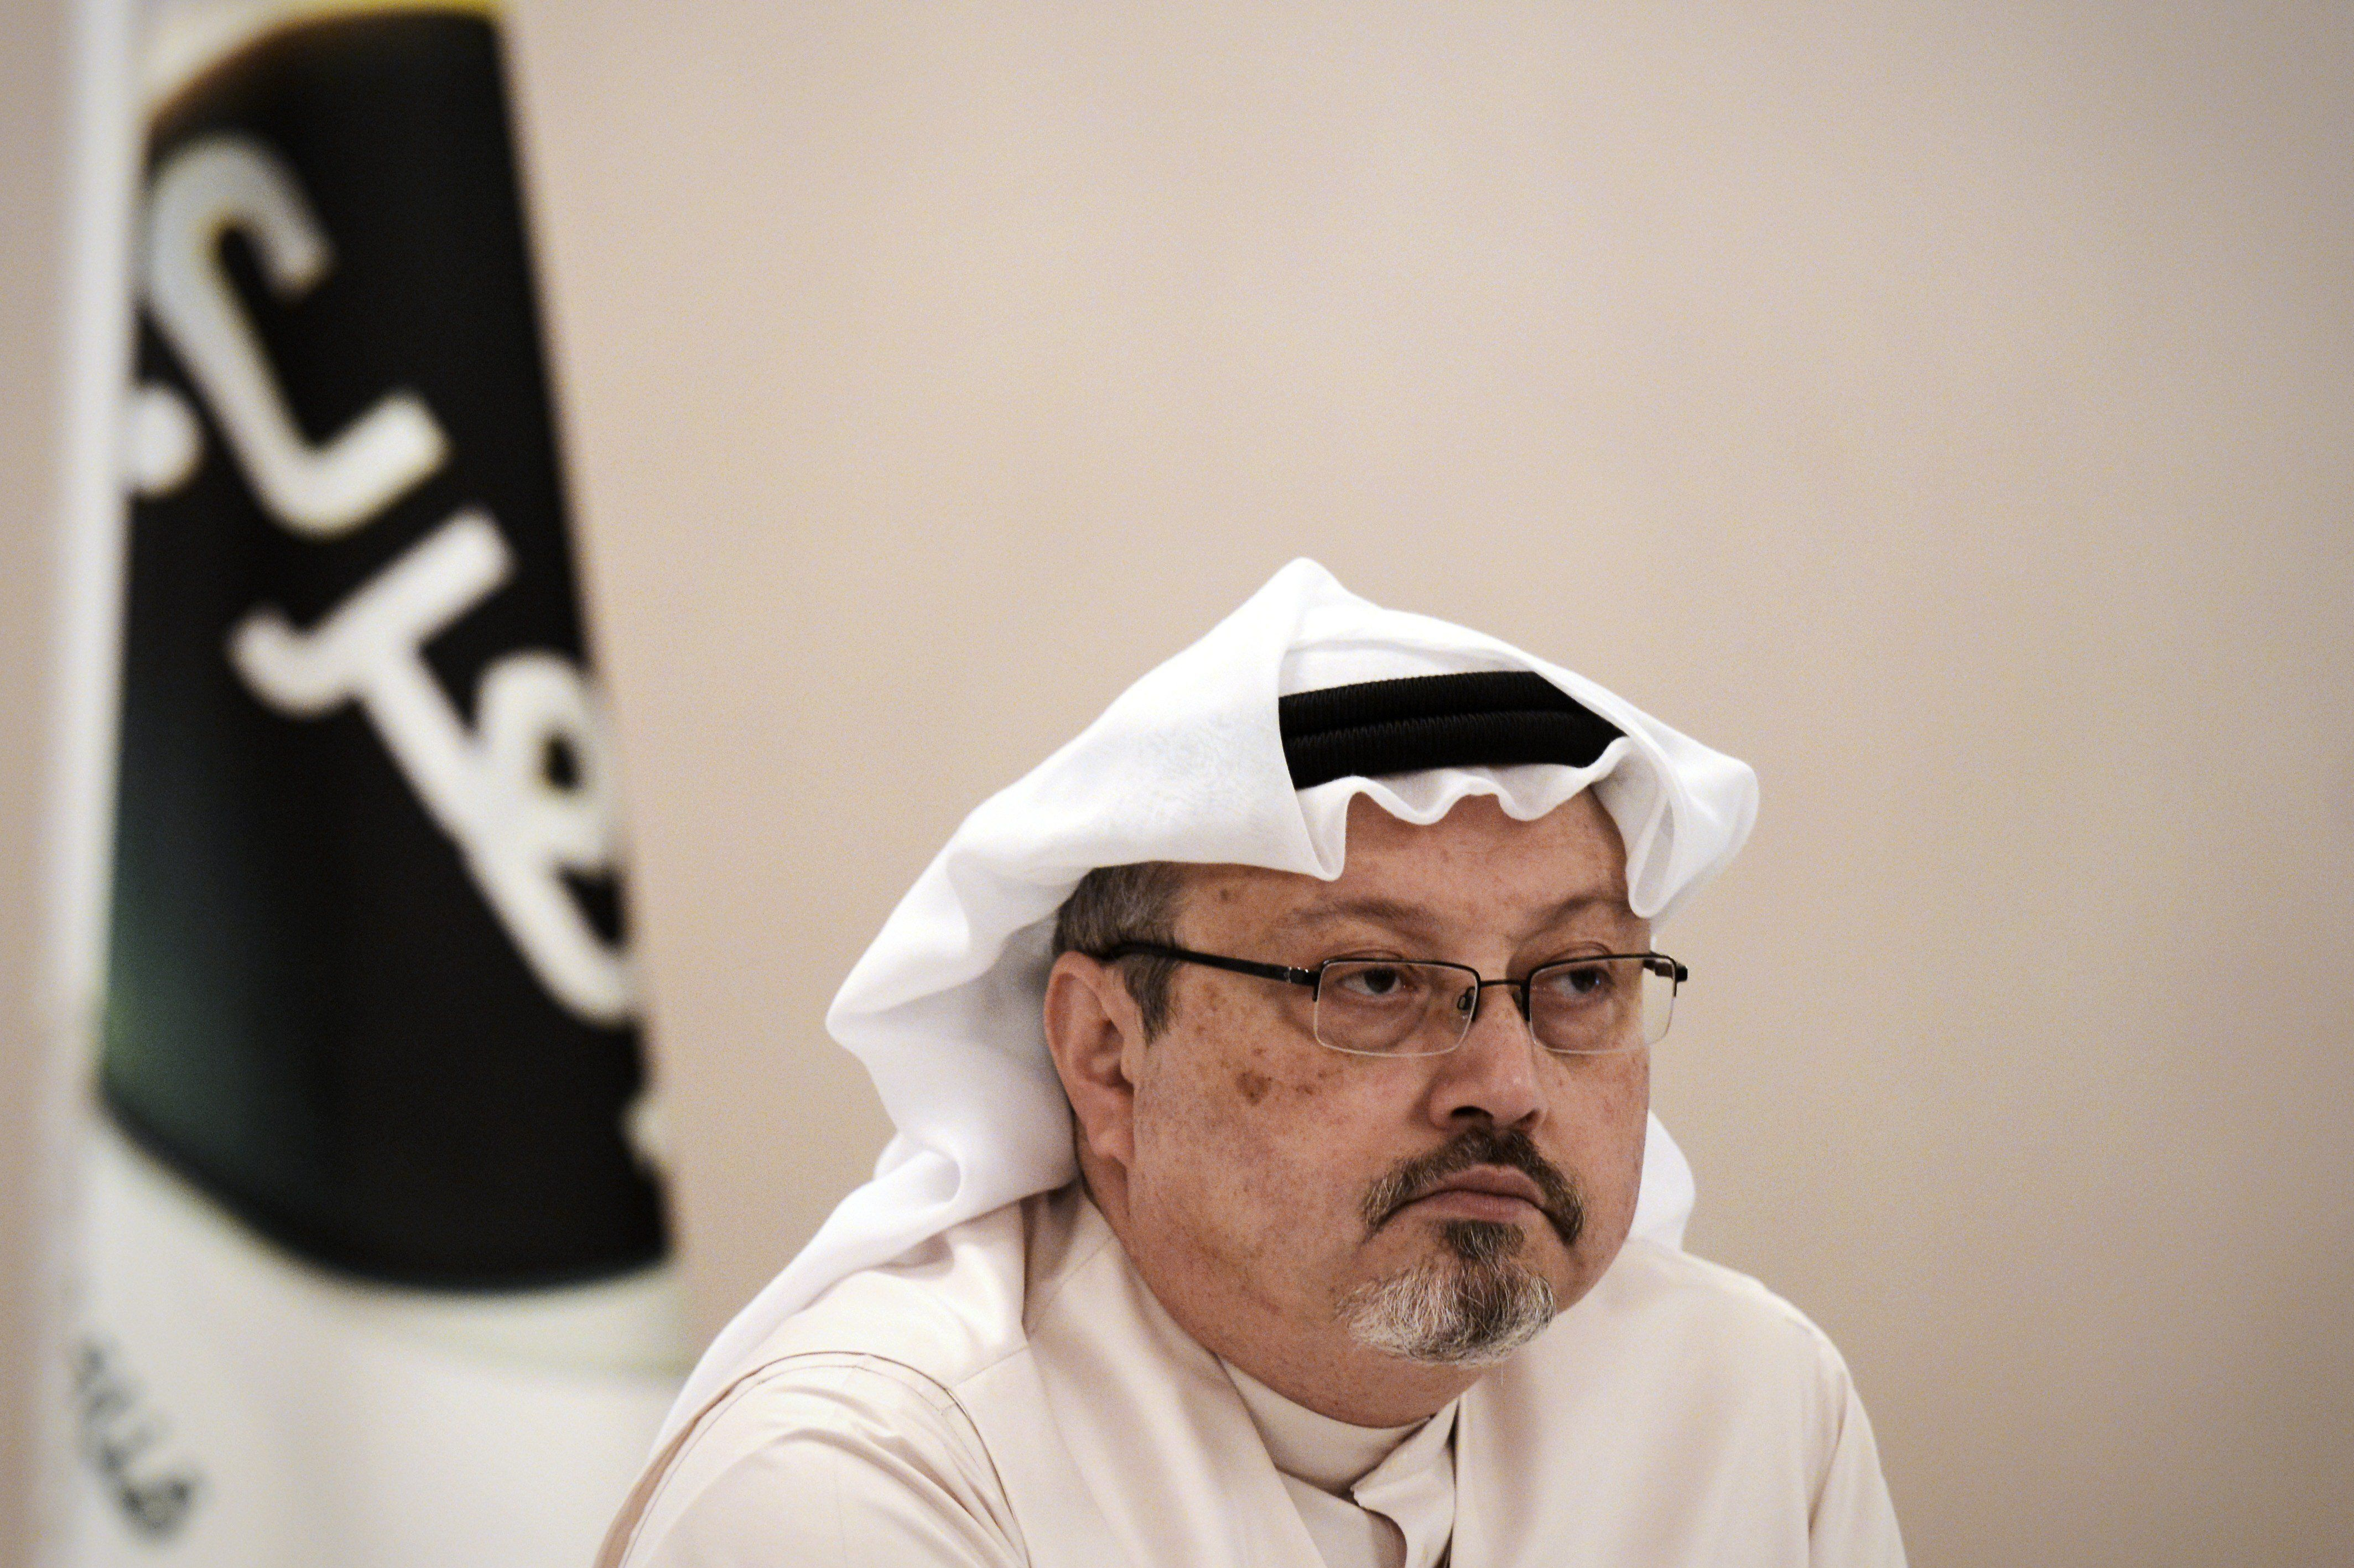 Jamal Khashoggi was last seen entering the Saudi Consulate in Istanbul on Oct.